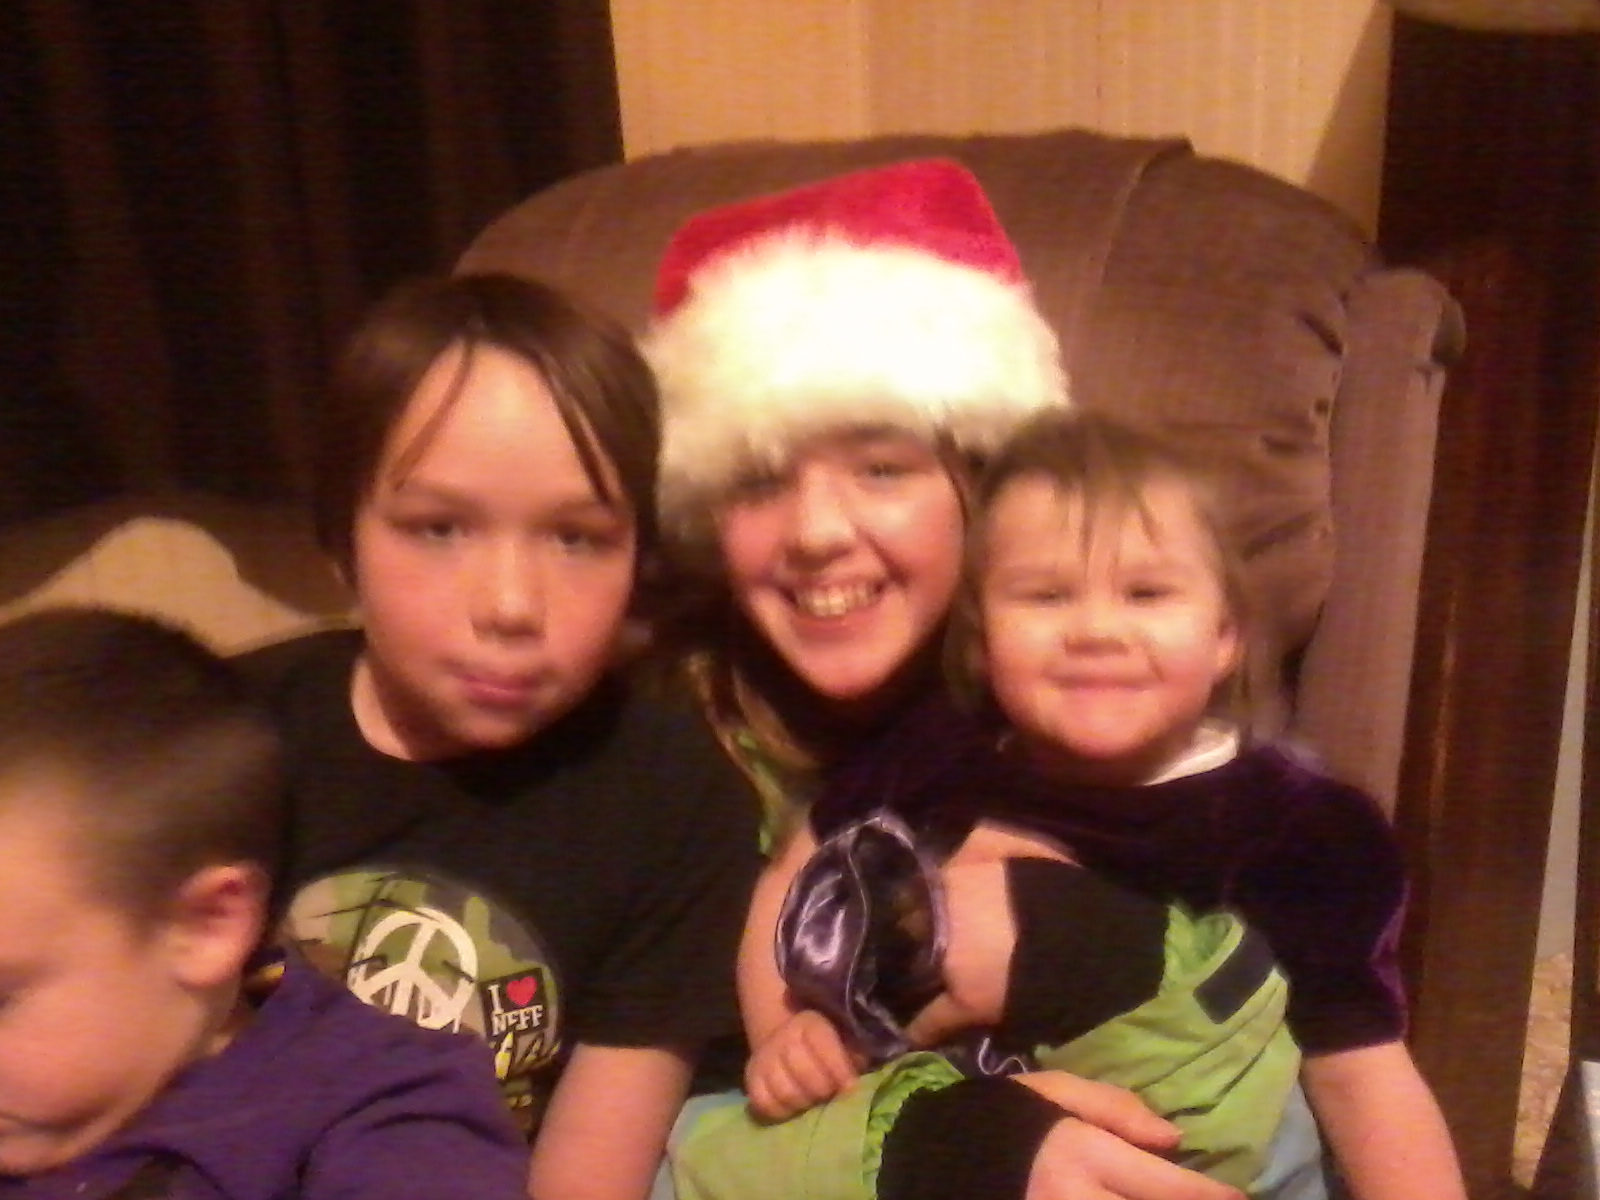 Caleb, Trinity, and baby Sammi.